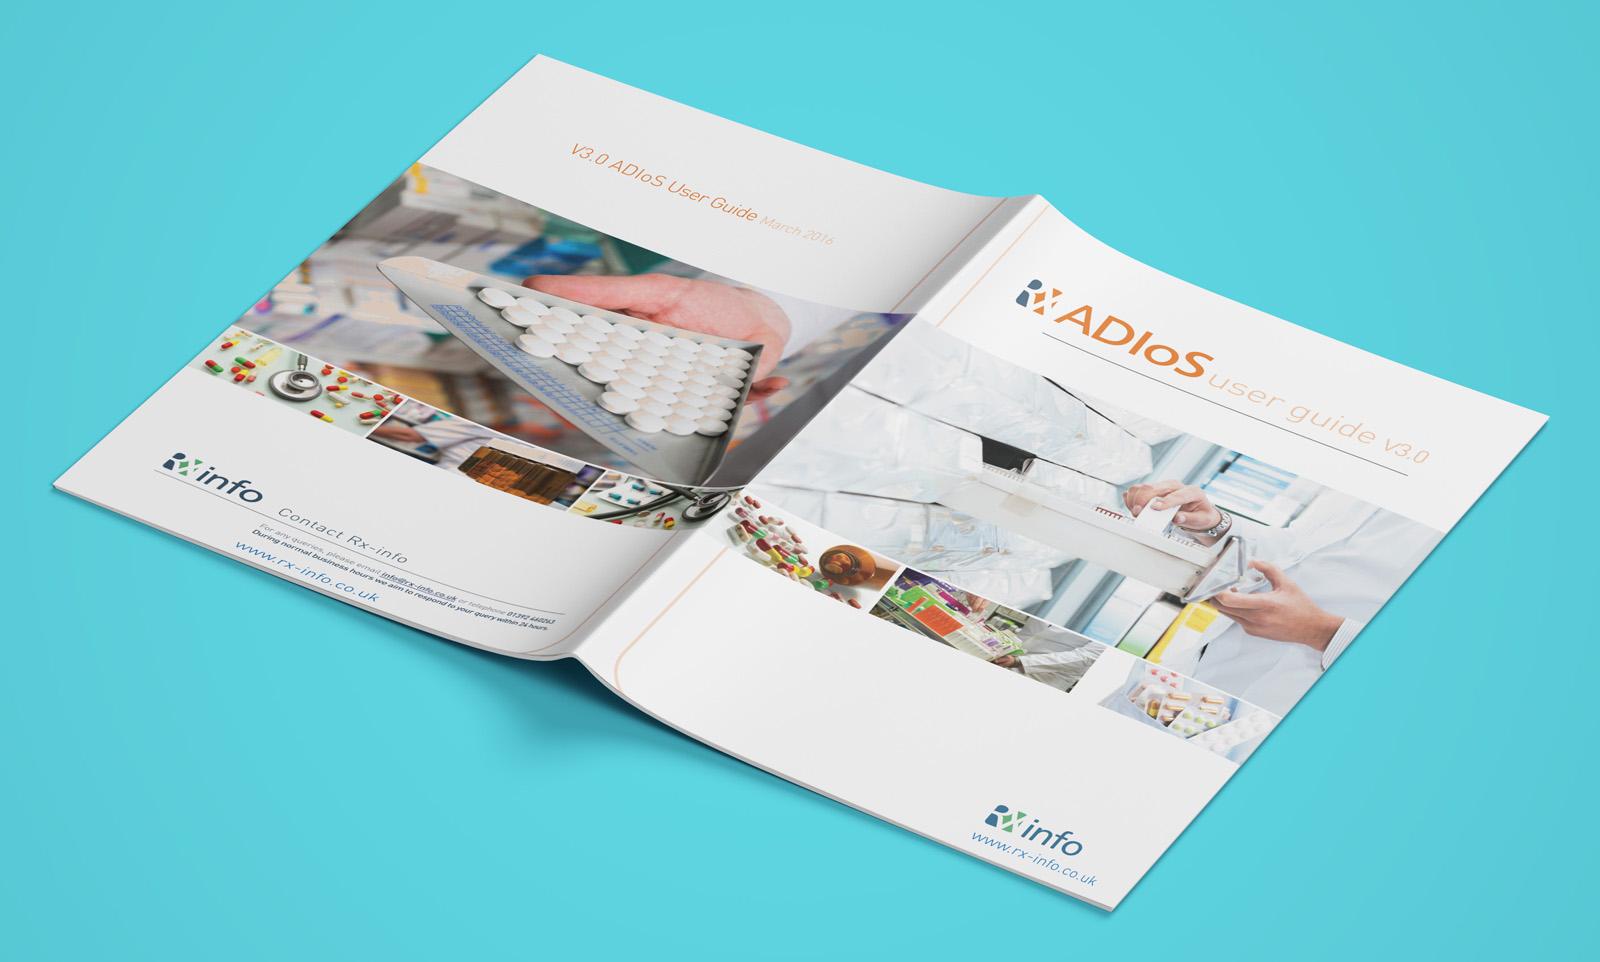 Rx-info brochure spread